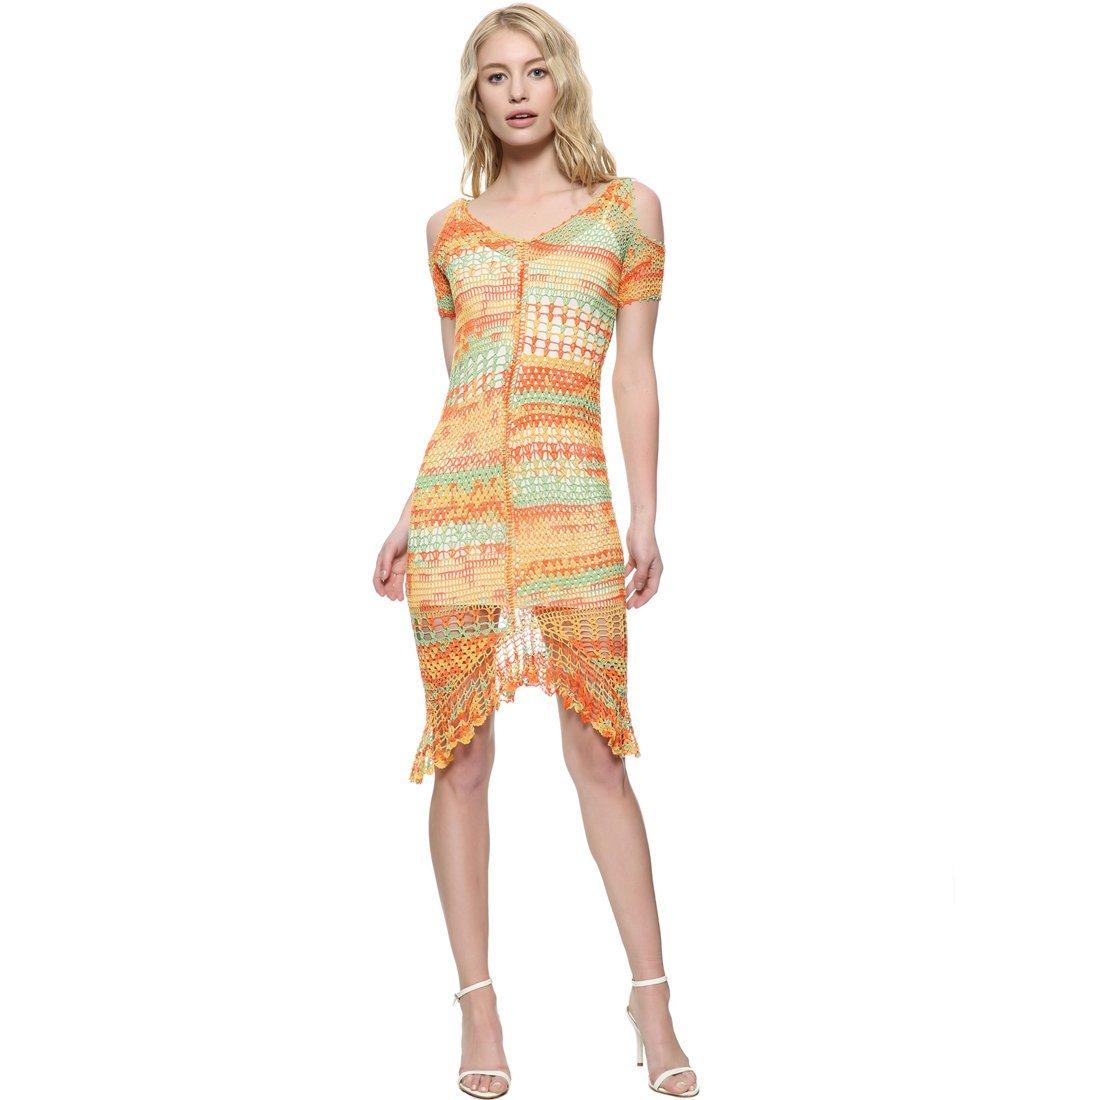 ZORJAR Women's V Neck Sexy Hollow Crochet Lace Dress by ZORJAR